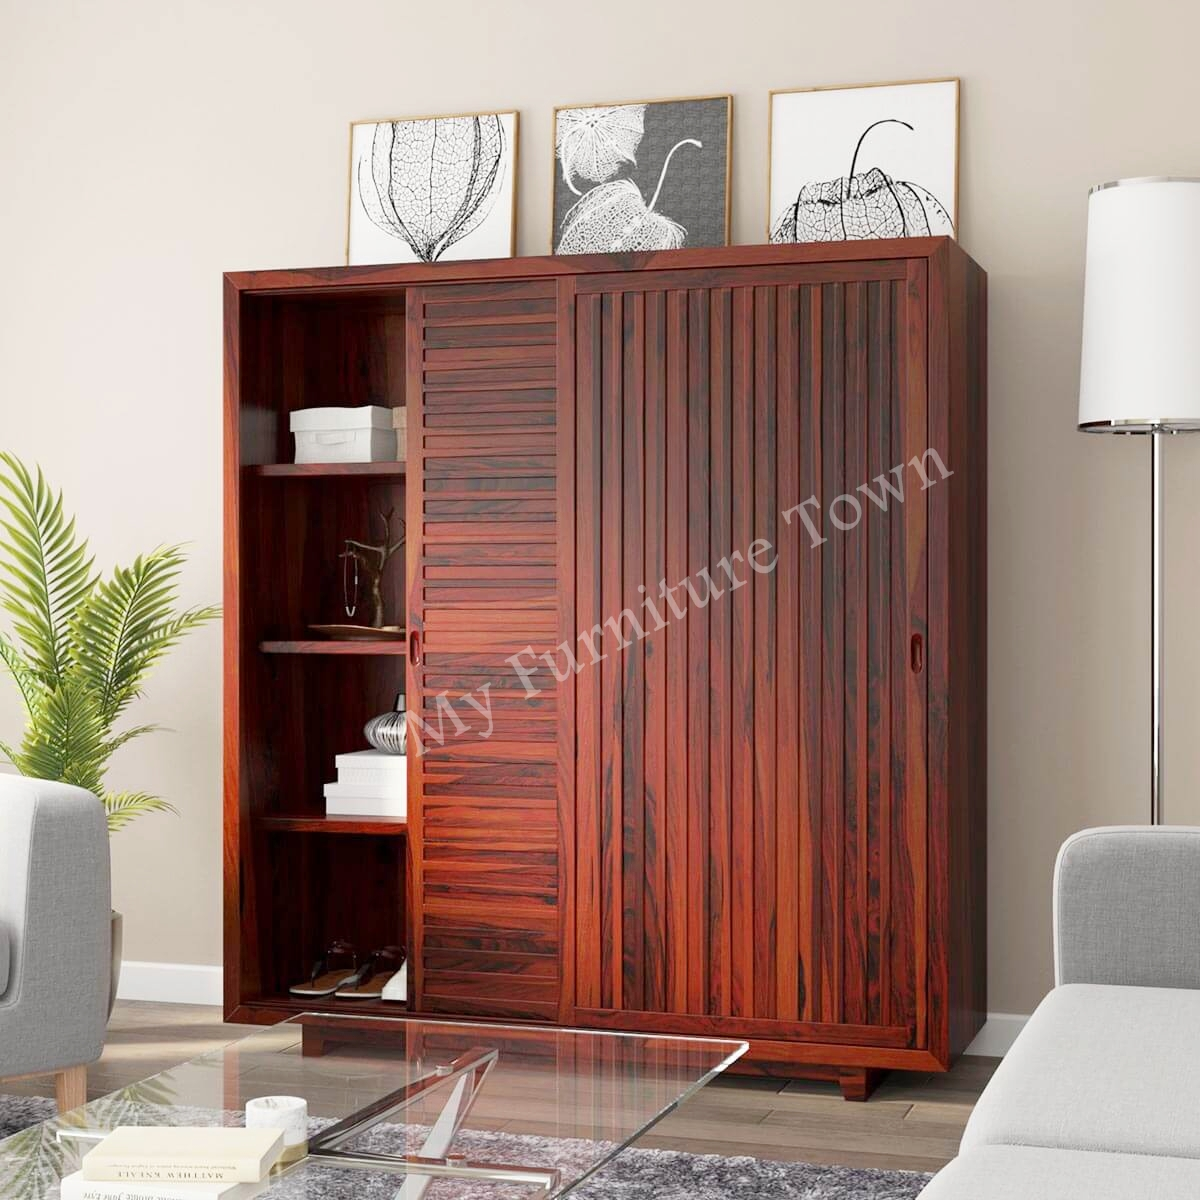 Stoni Large Rustic Sheesham Solid Wood Sliding Door Wardrobe With Shelves